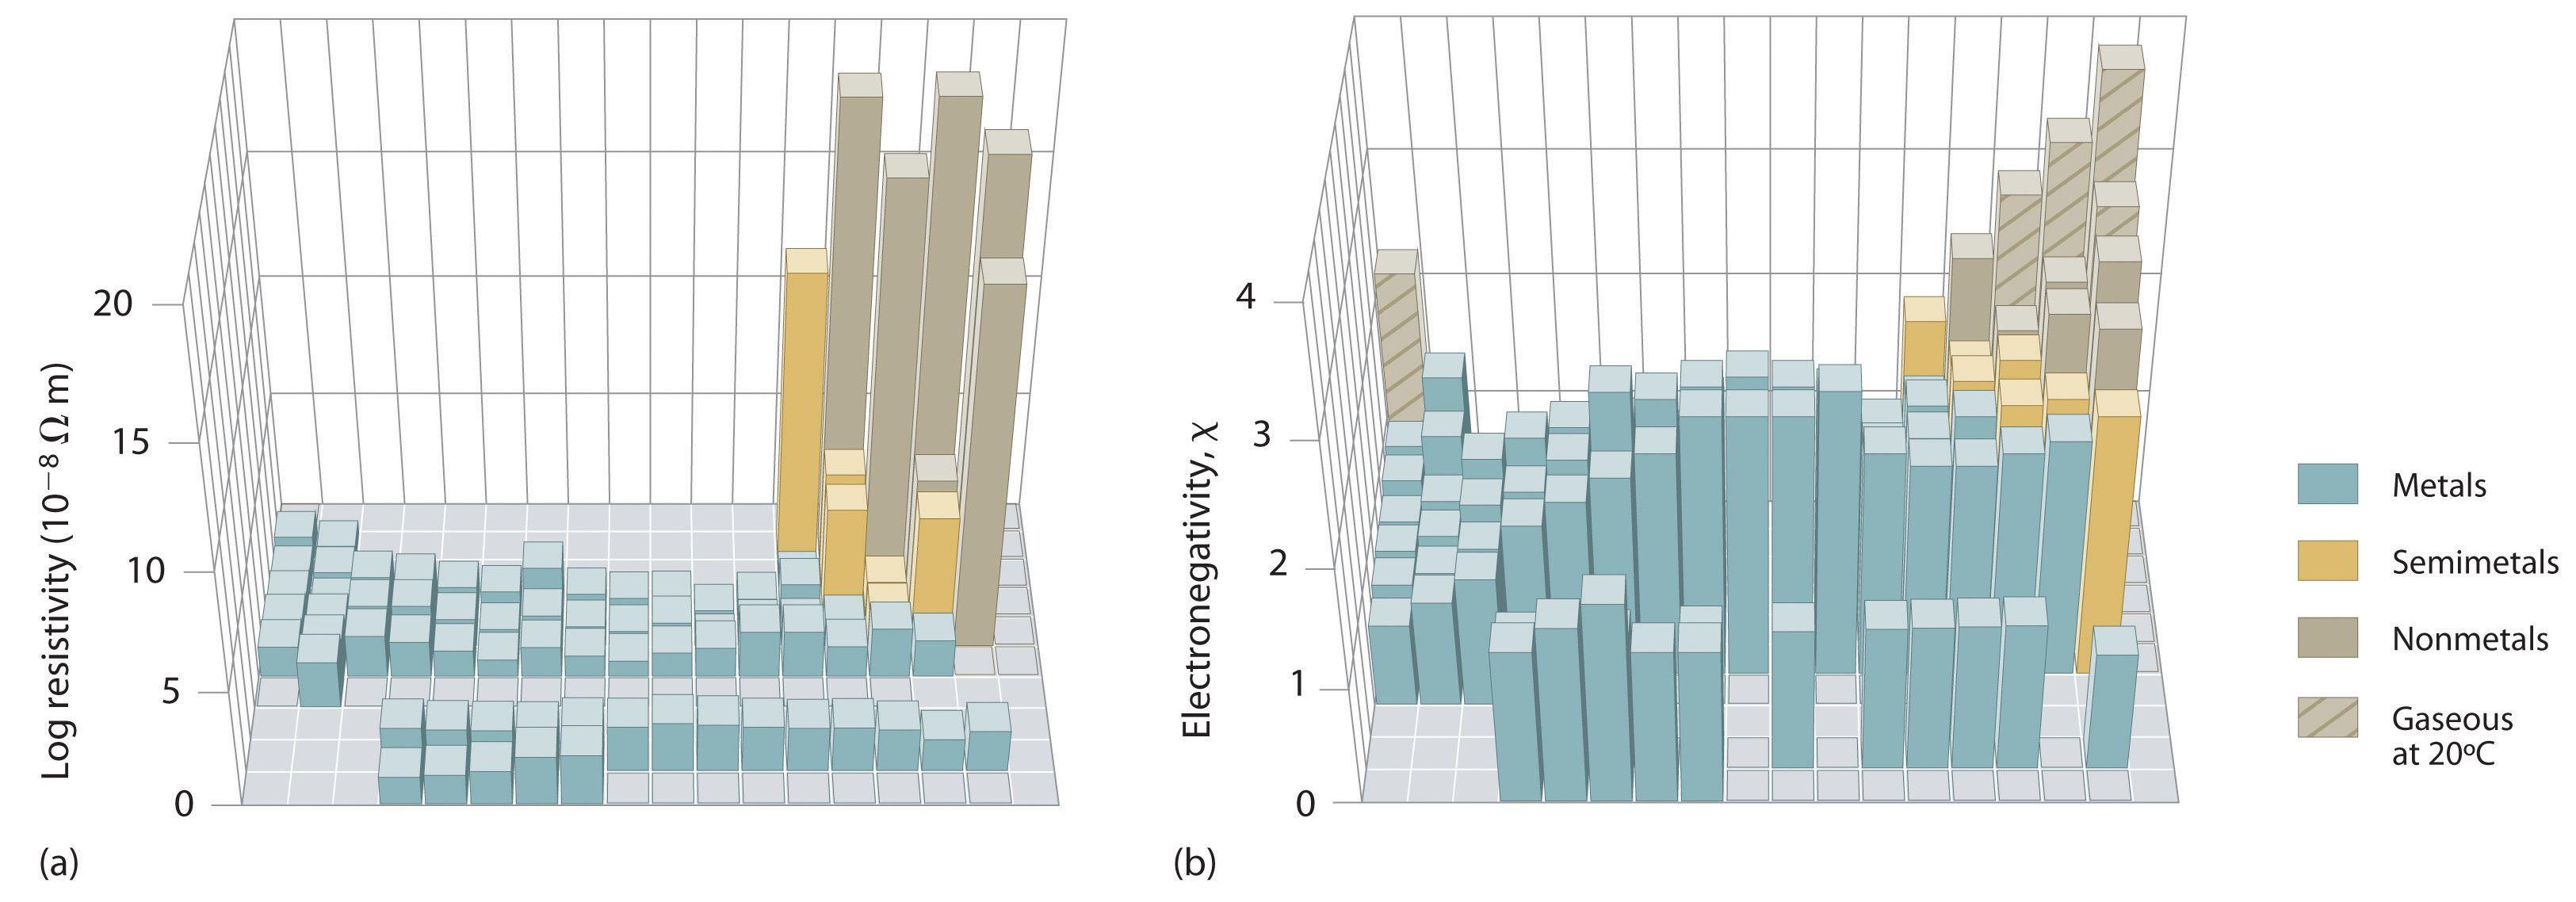 Diagonal Periodic Table Relationships